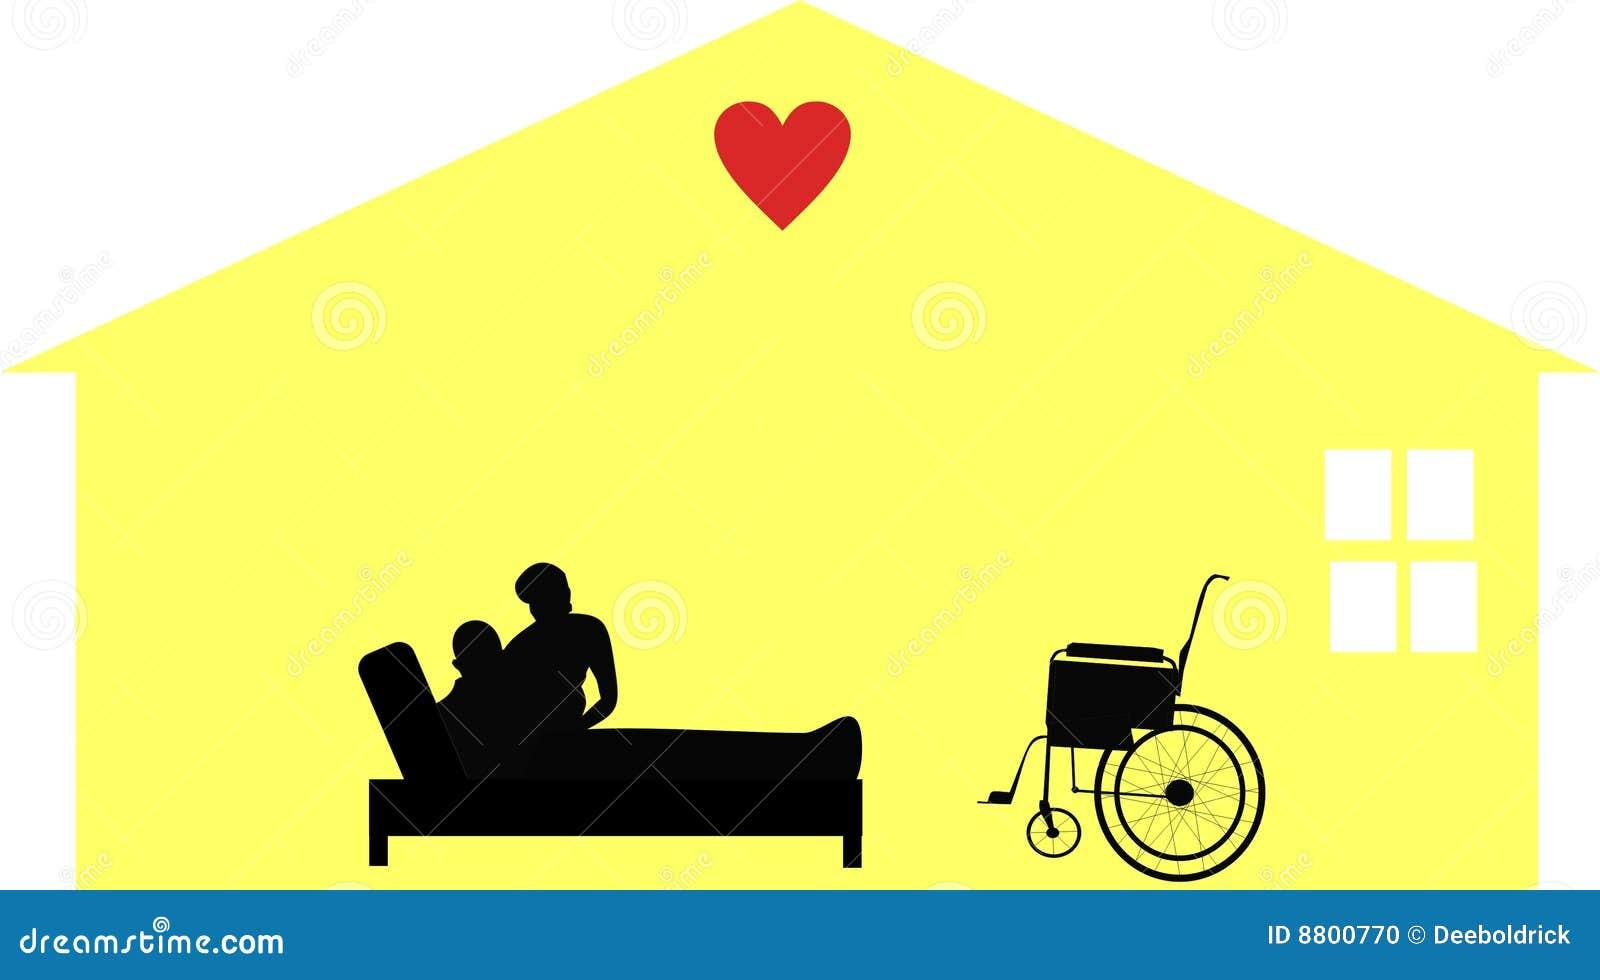 free clip art home care - photo #19